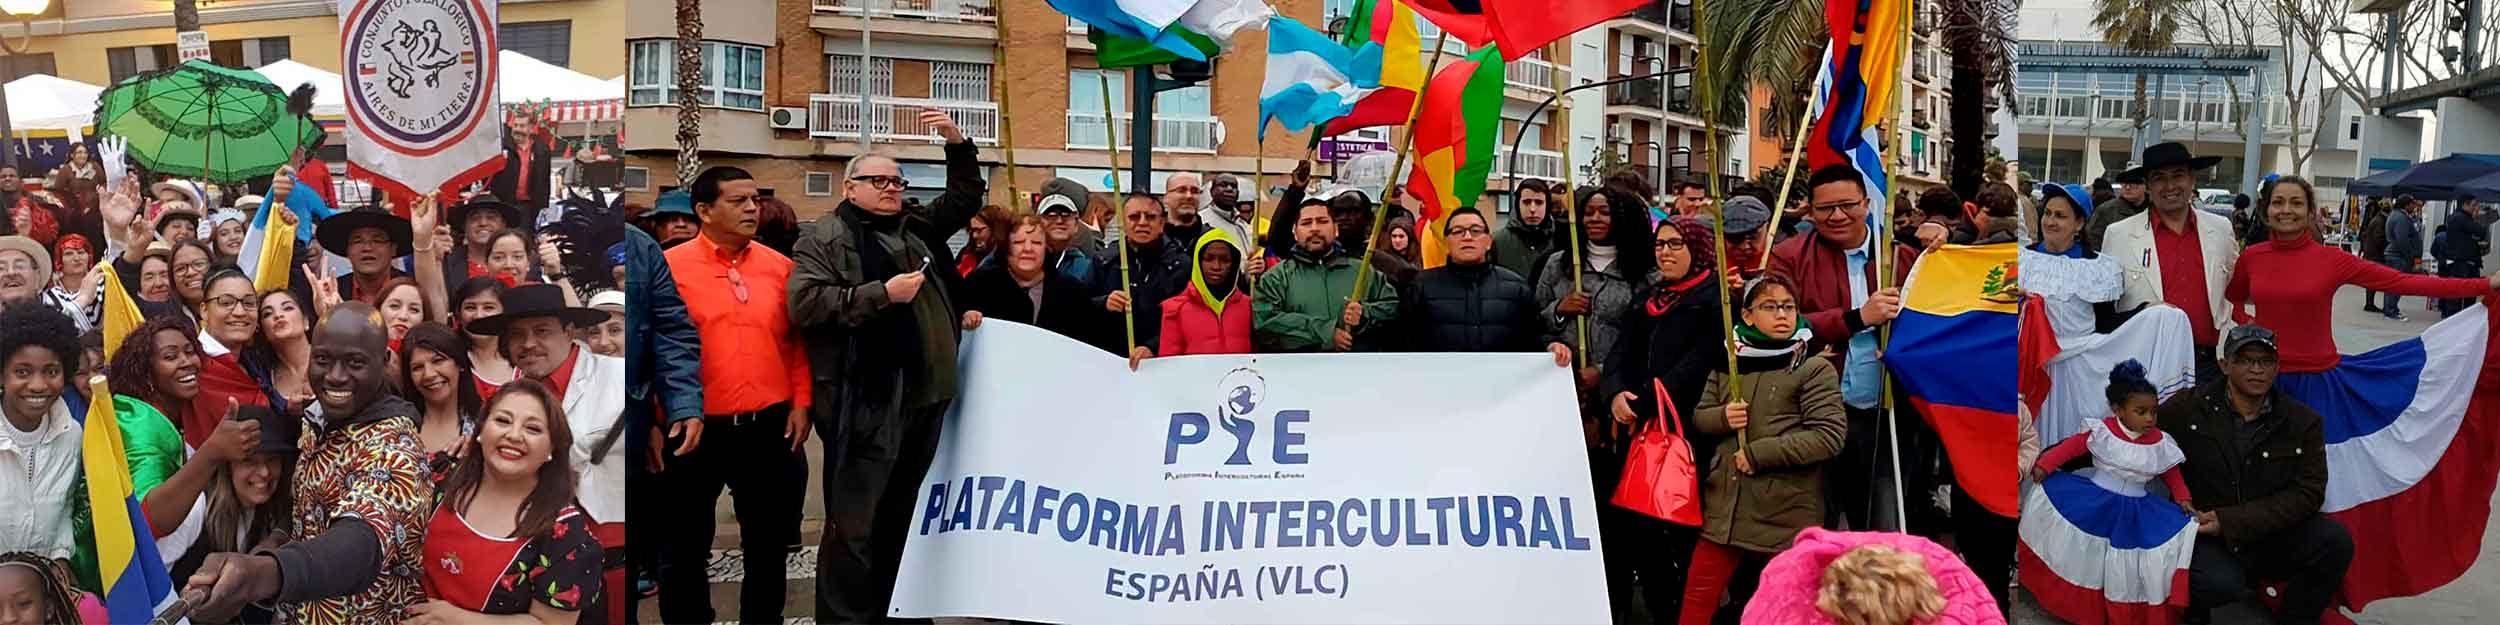 Plataforma Intercultural de España